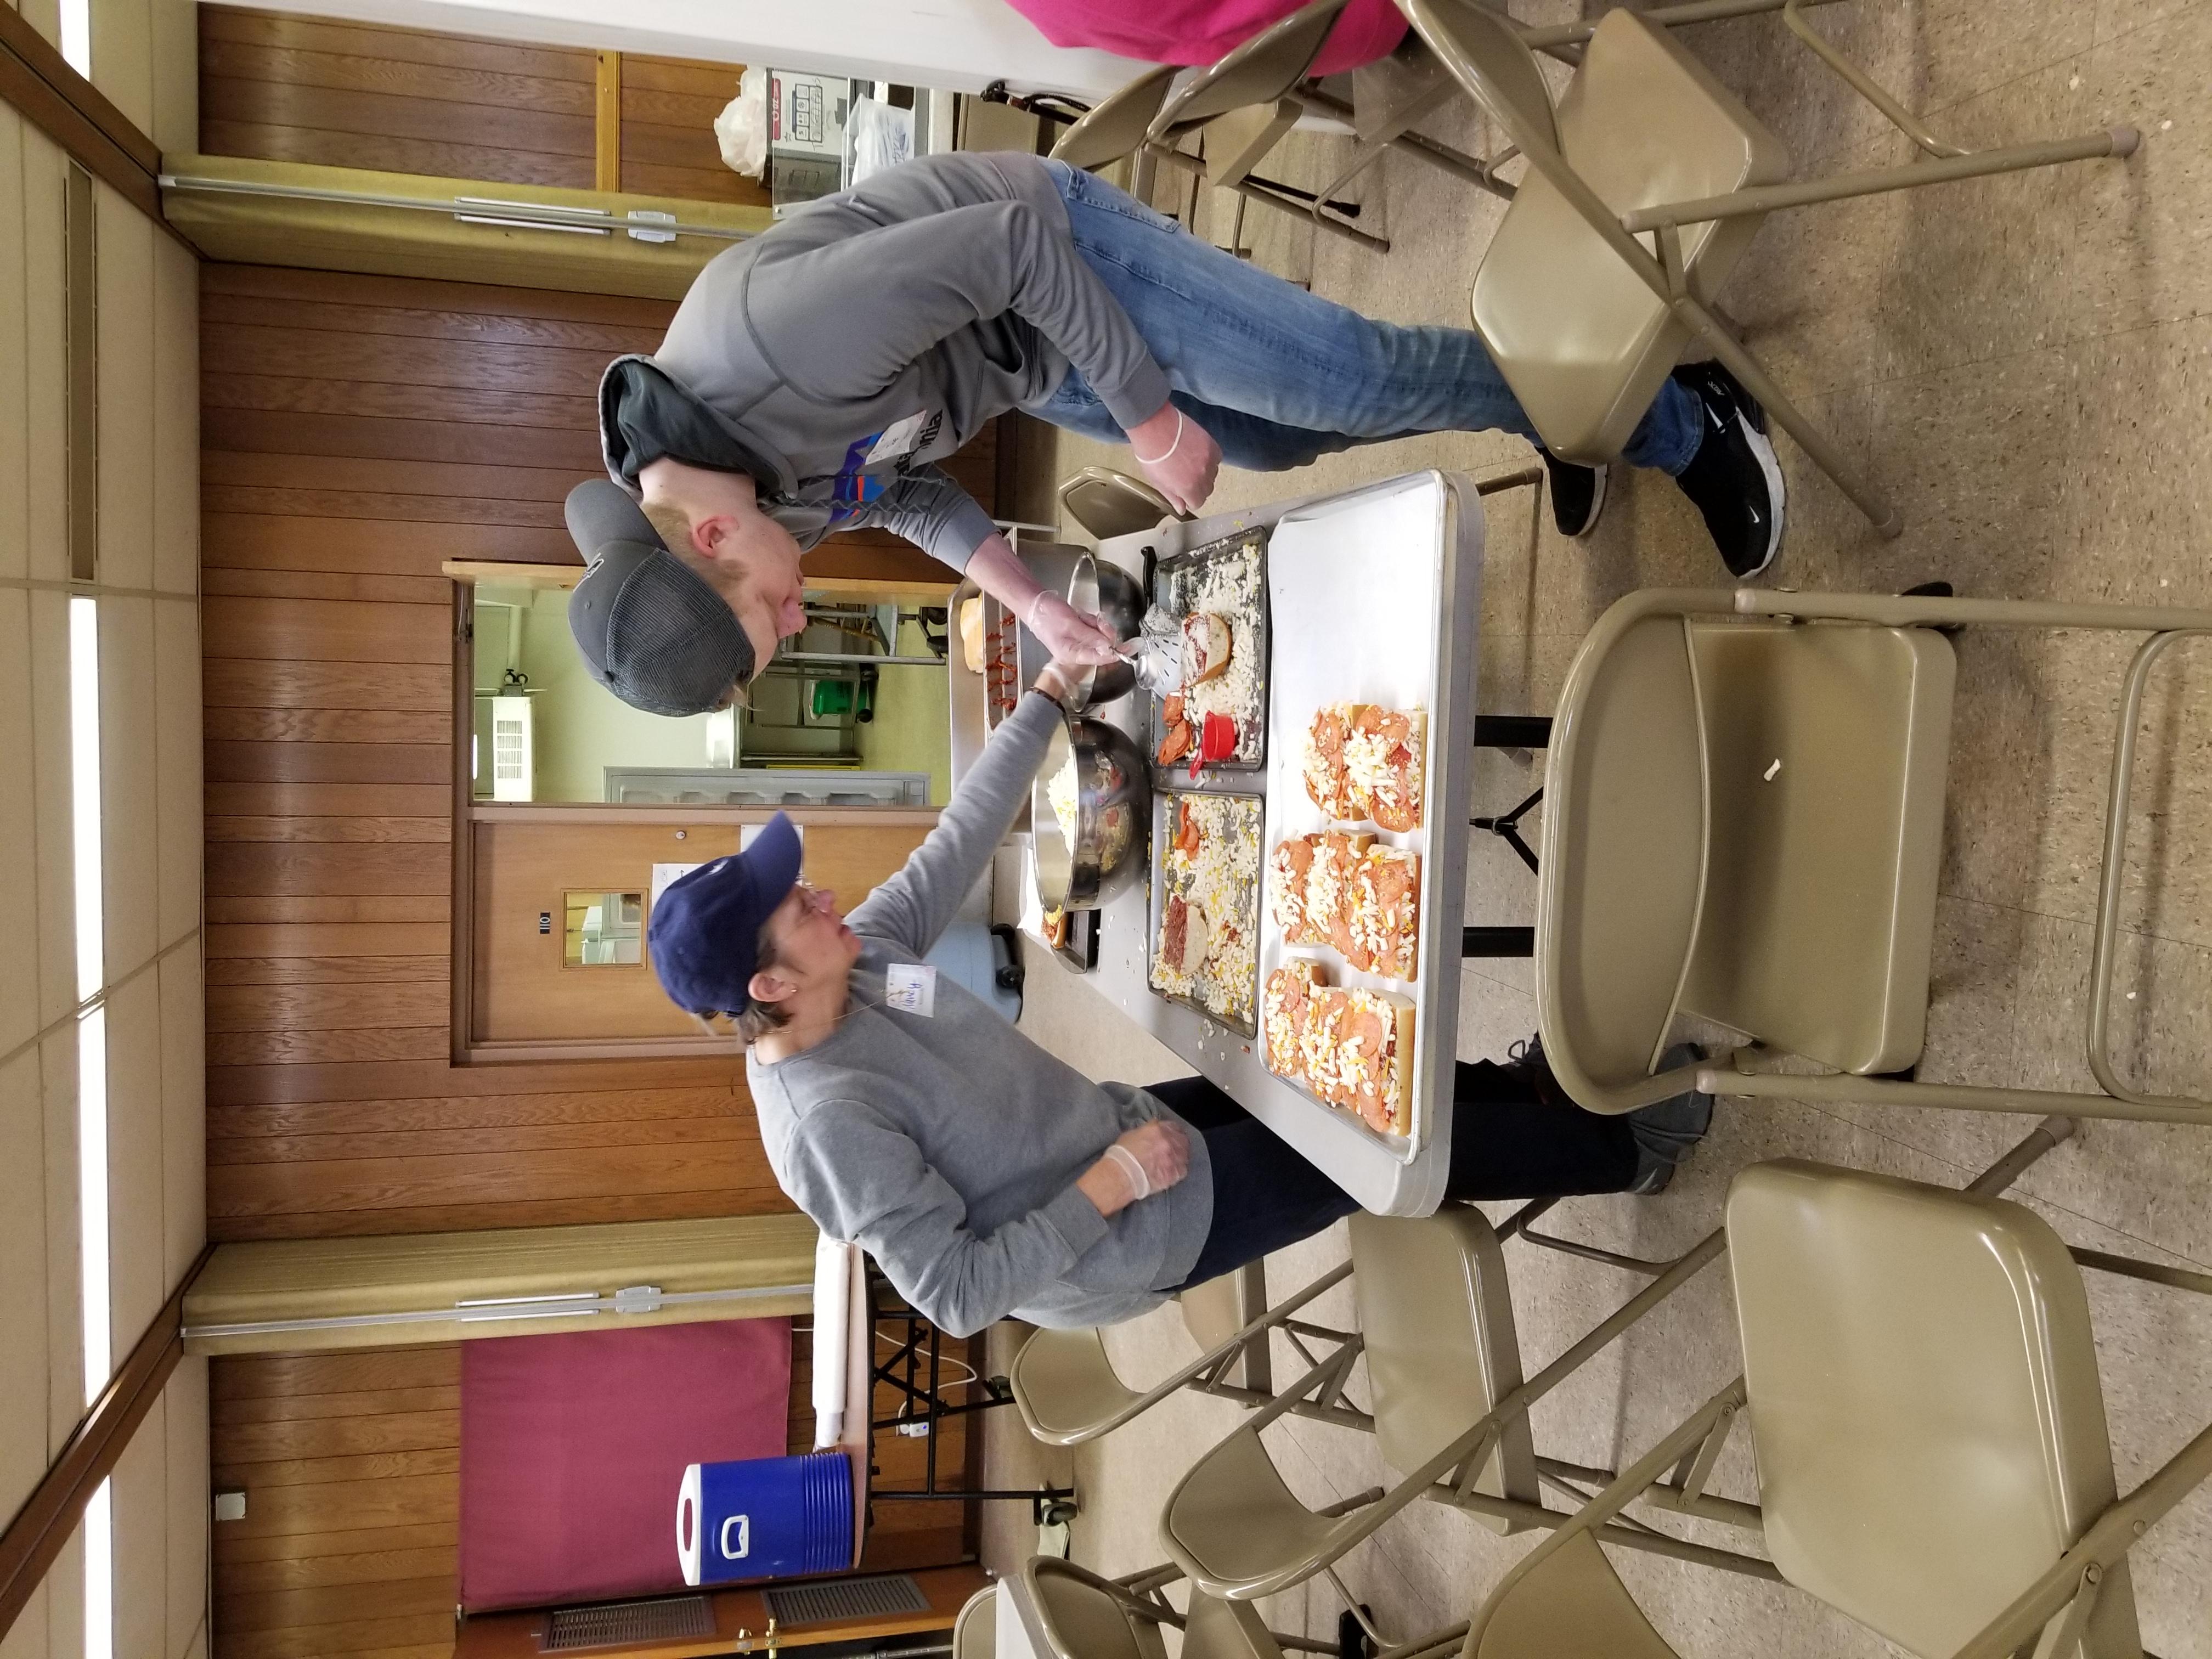 1-13-2020 Nancy & Joe making pizza melts